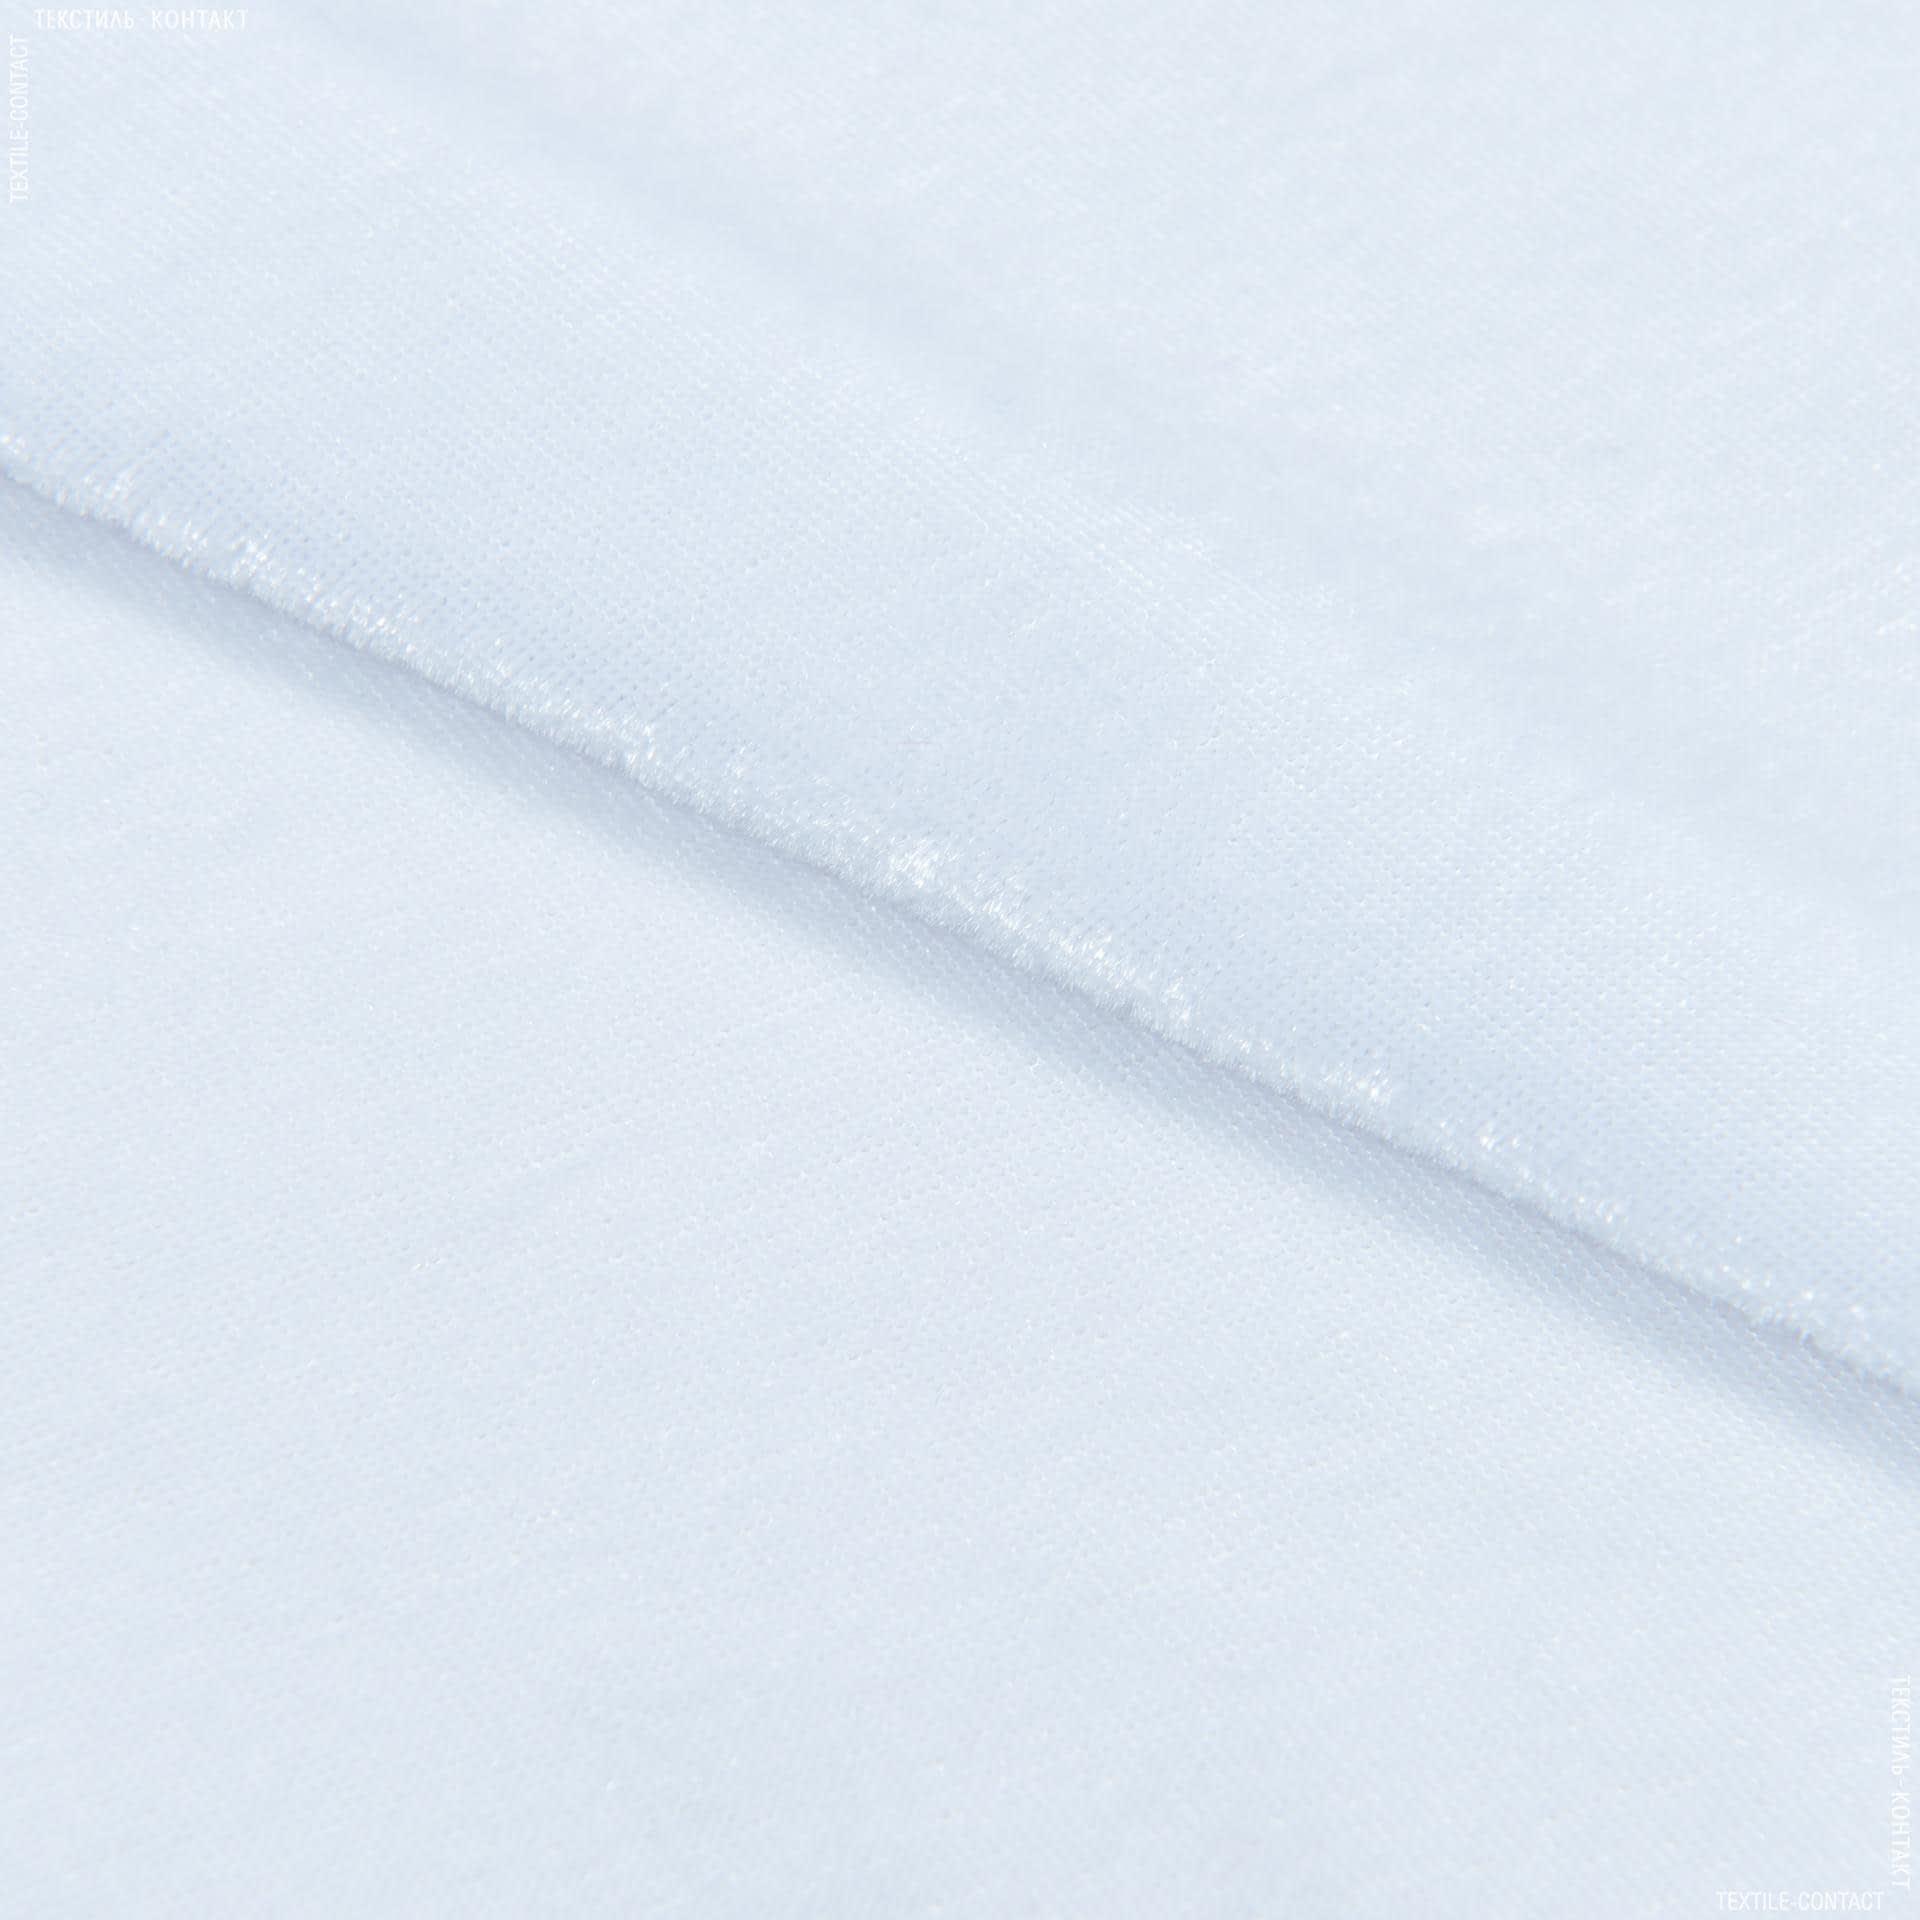 Тканини для суконь - Велюр стрейч білий